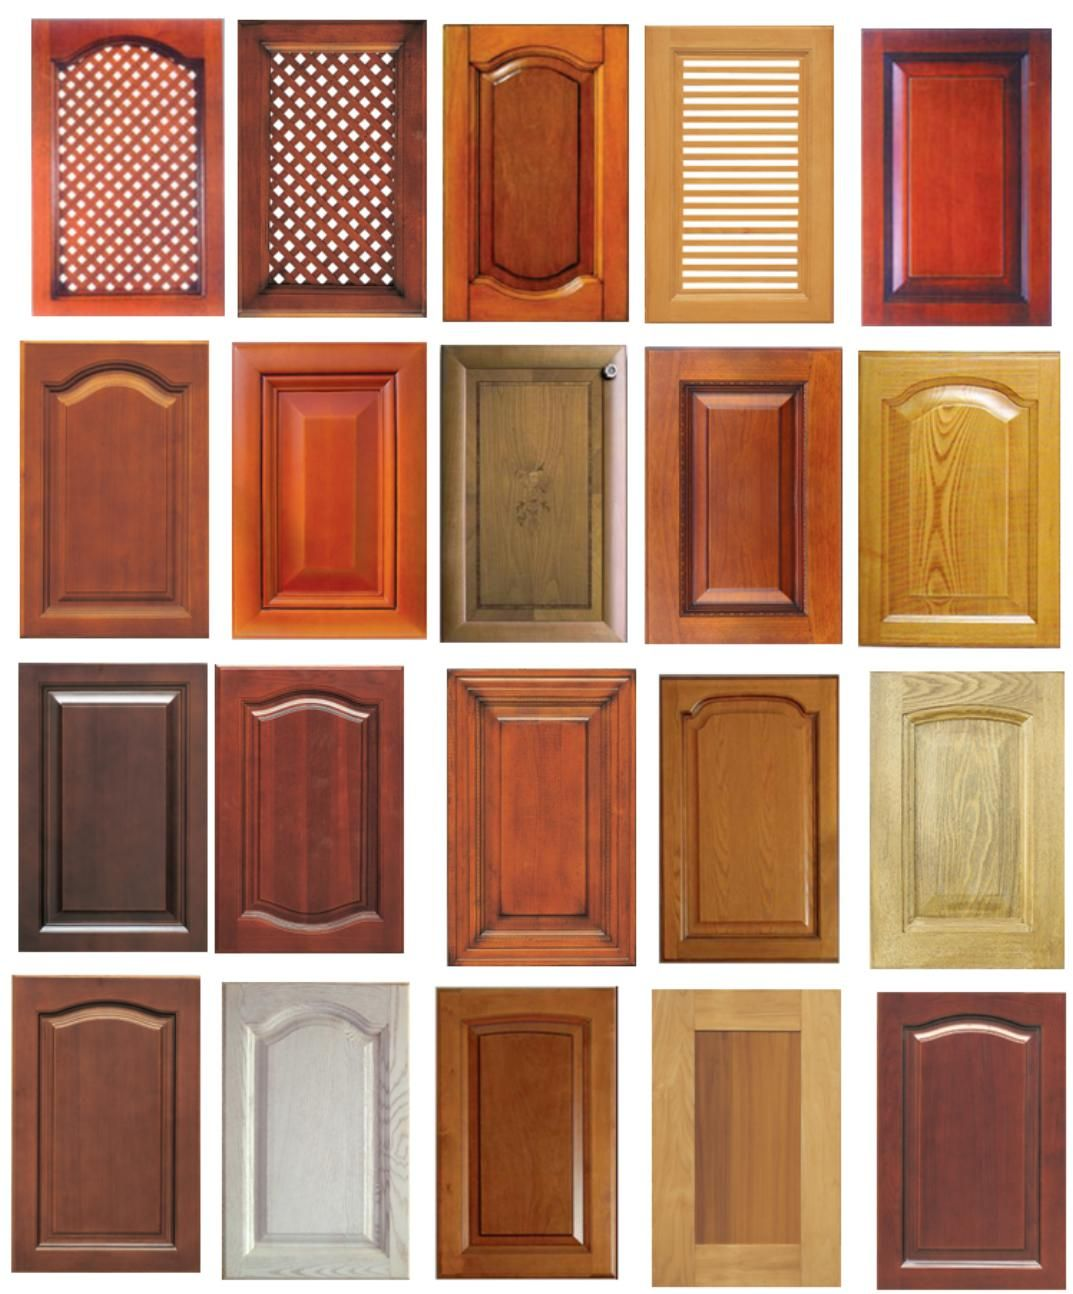 Refinishing Oak Kitchen Cabinets Ideas: Pin By Wilma Norsworthy On Kitchen Ideas